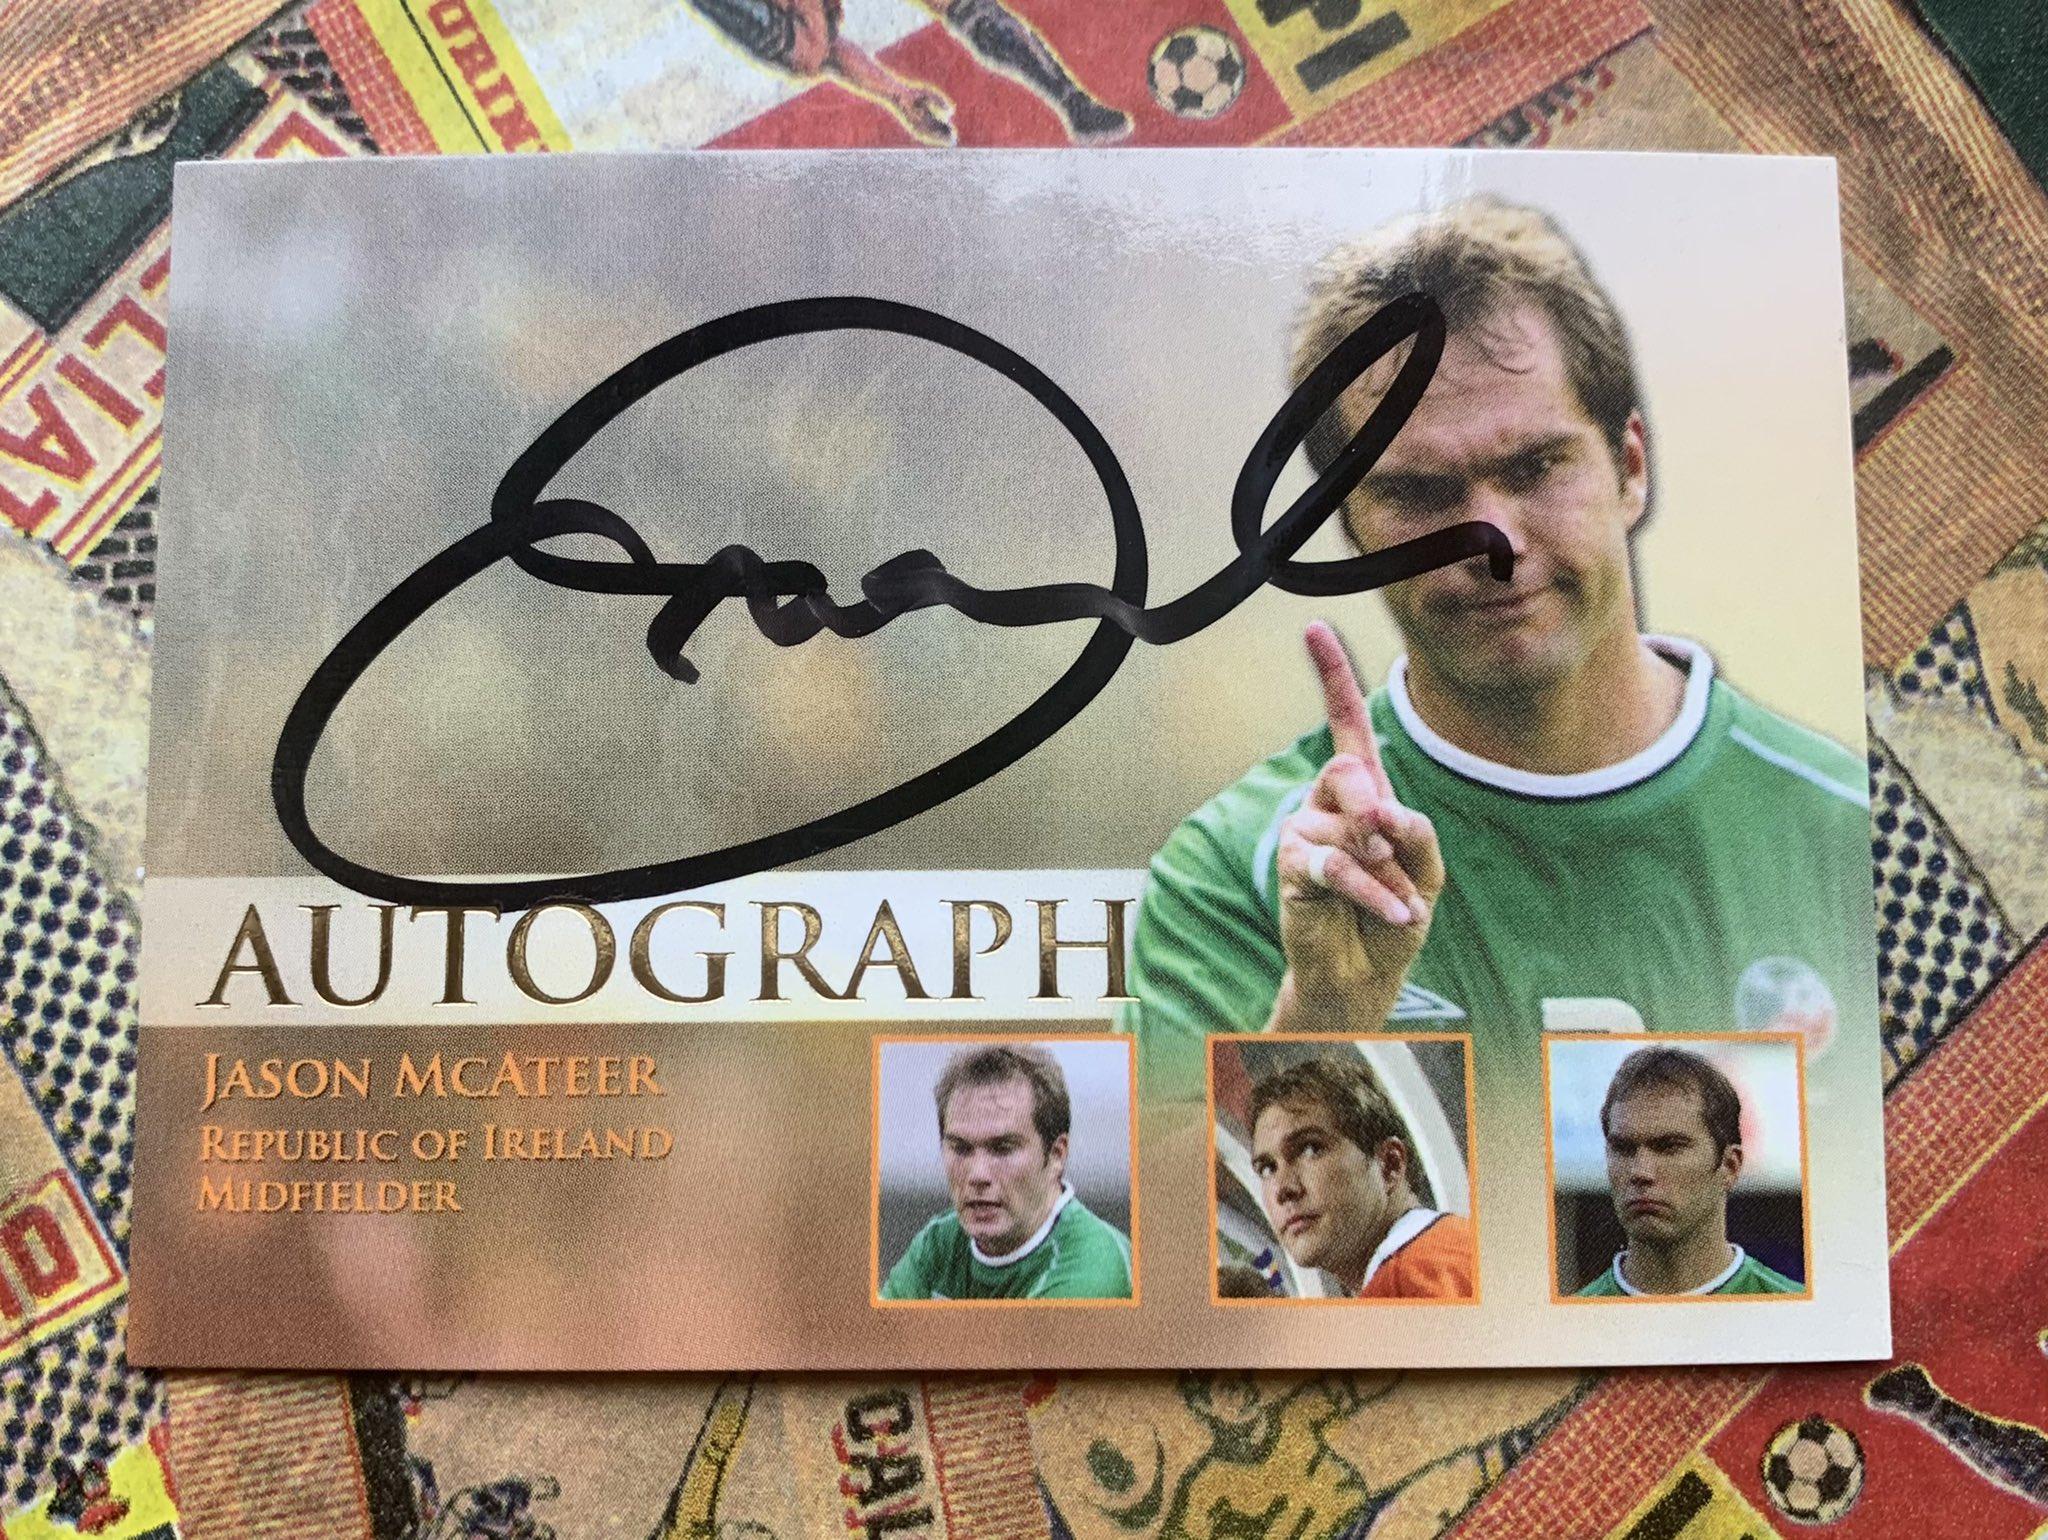 Jason McAteer in Unique 2013 Autograph card /55  Happy birthday